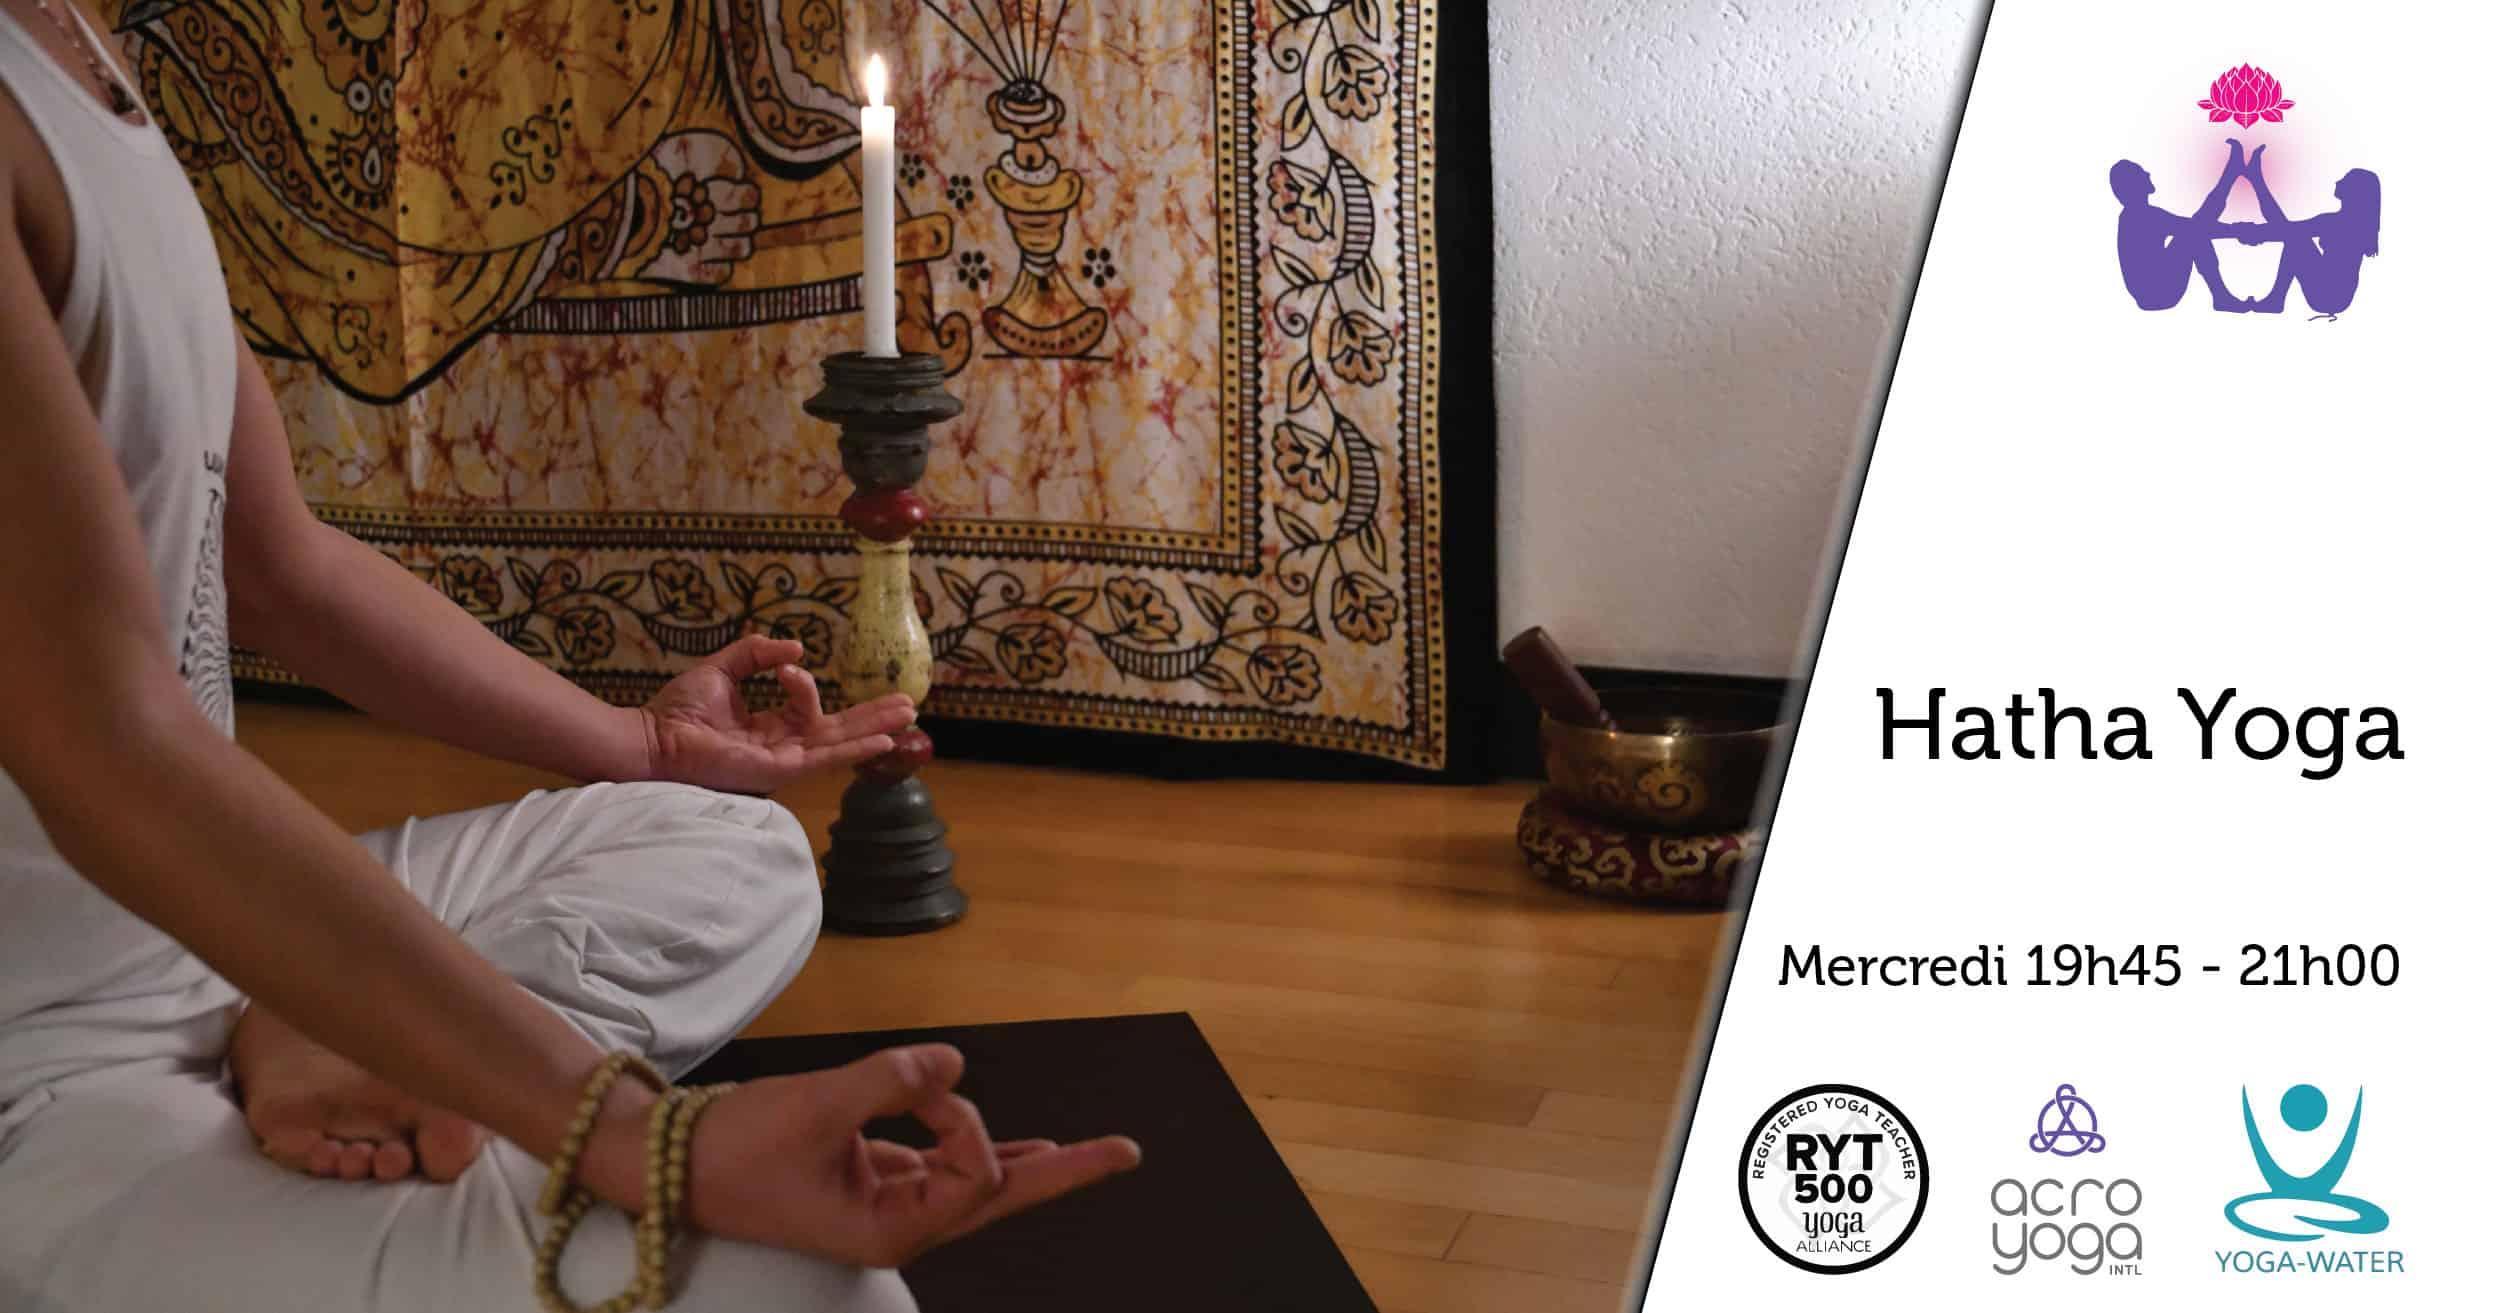 Hatha Yoga cours du mercredi